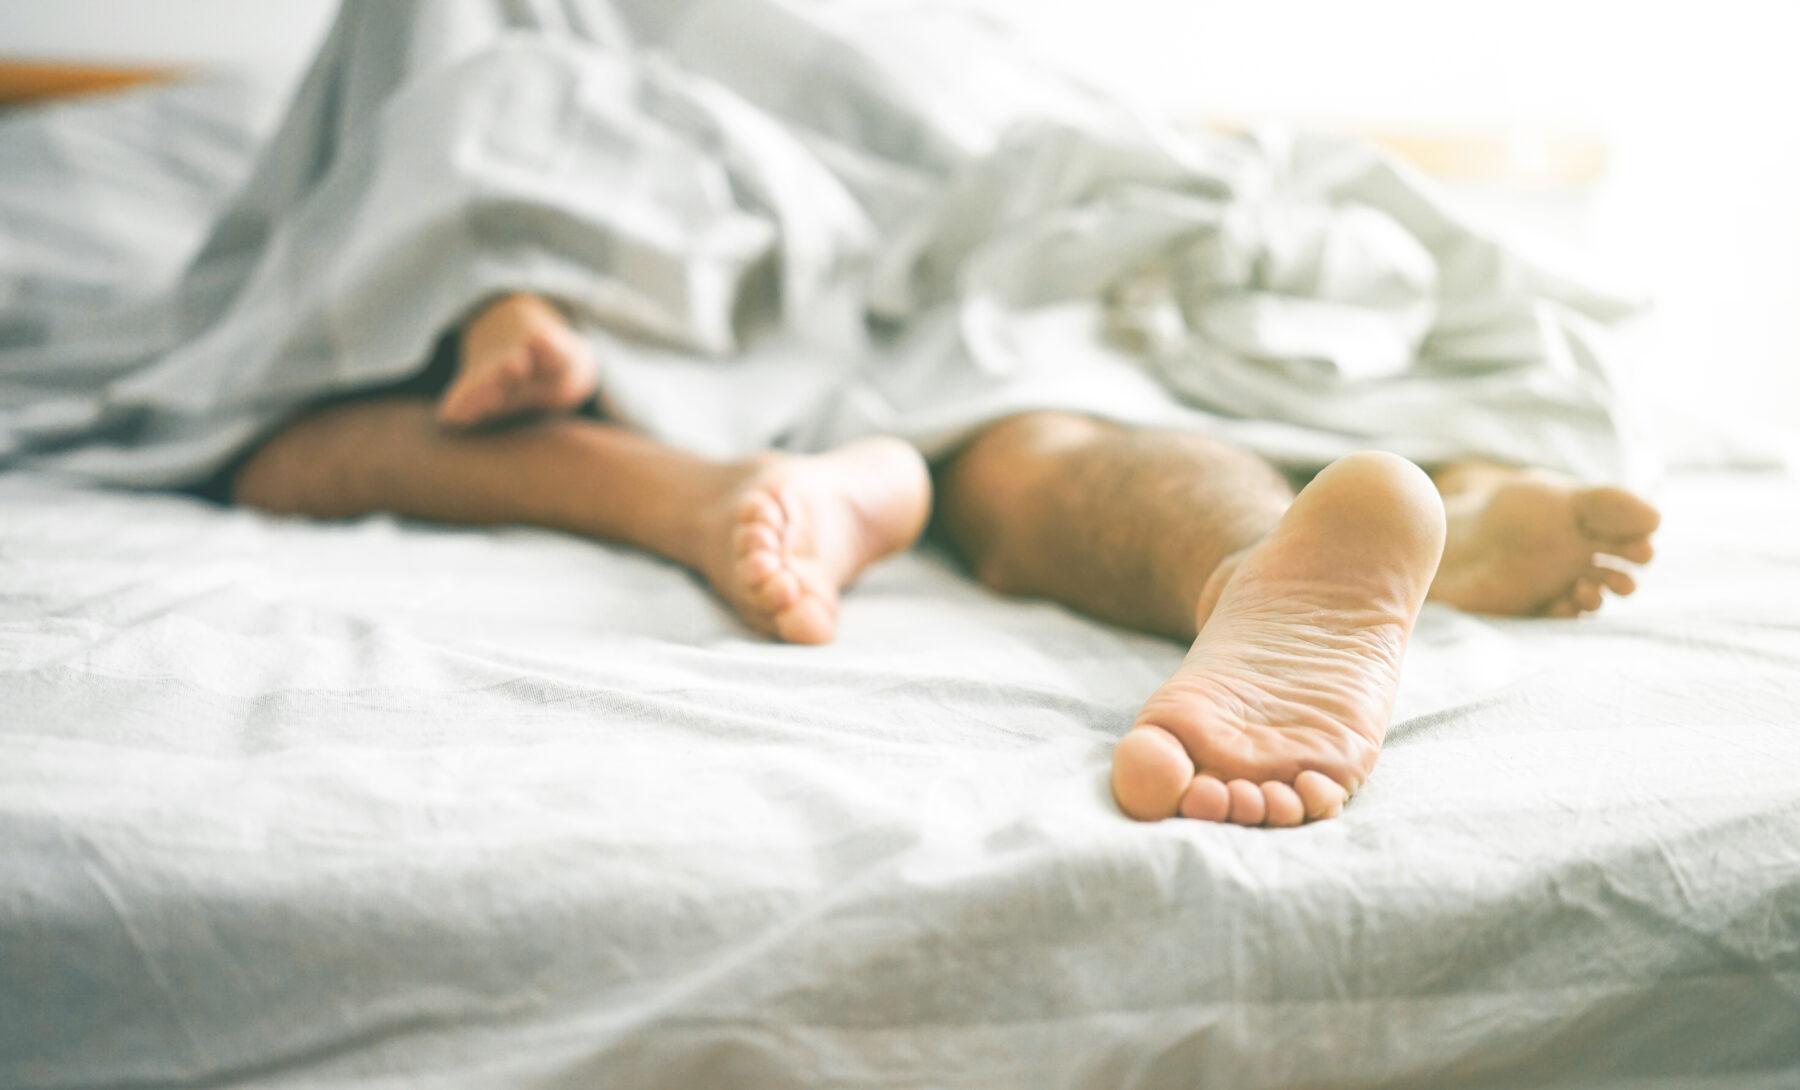 beter in bed